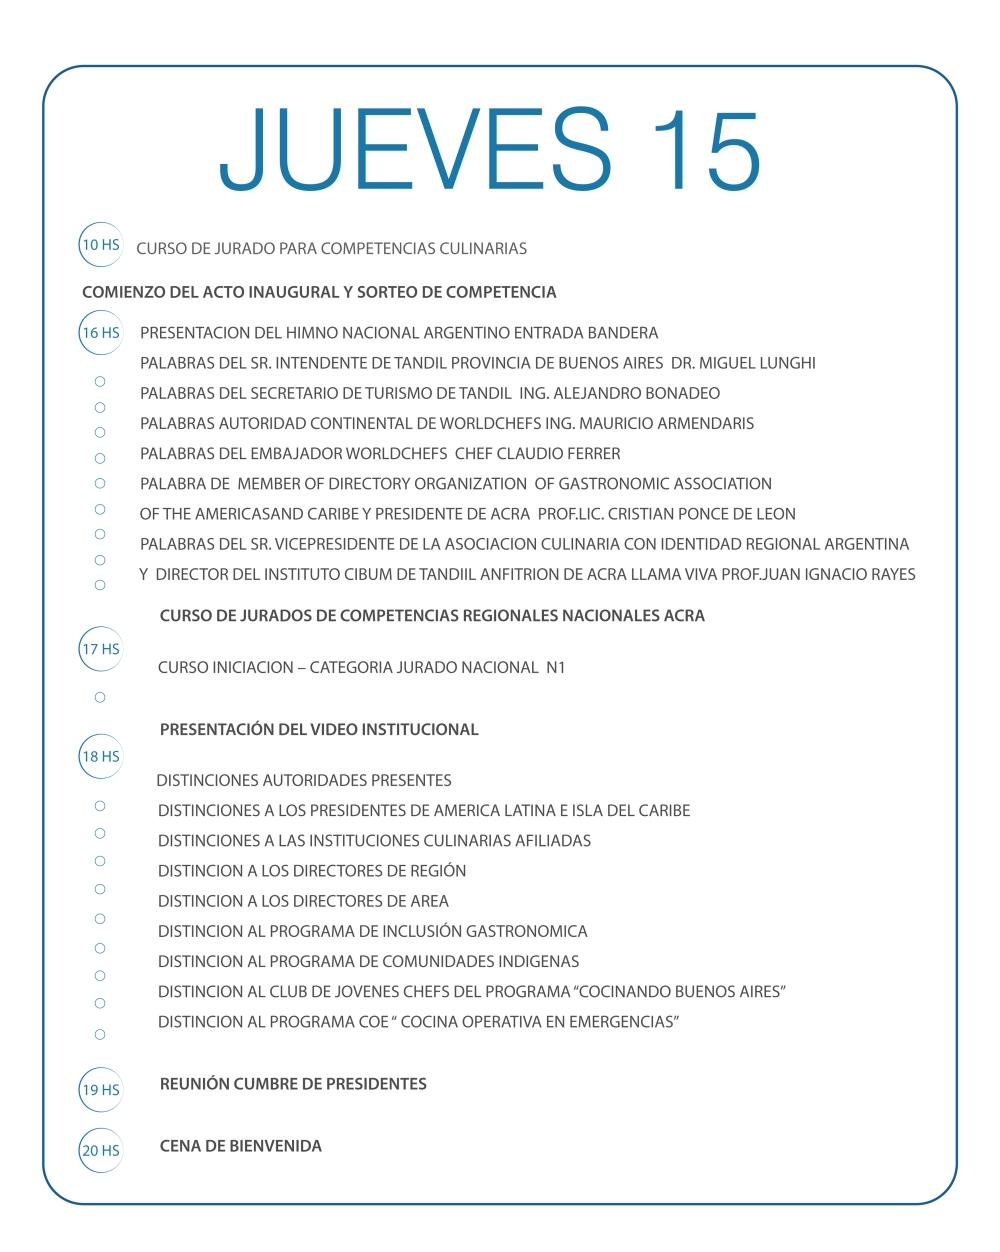 JUEVES 15-01